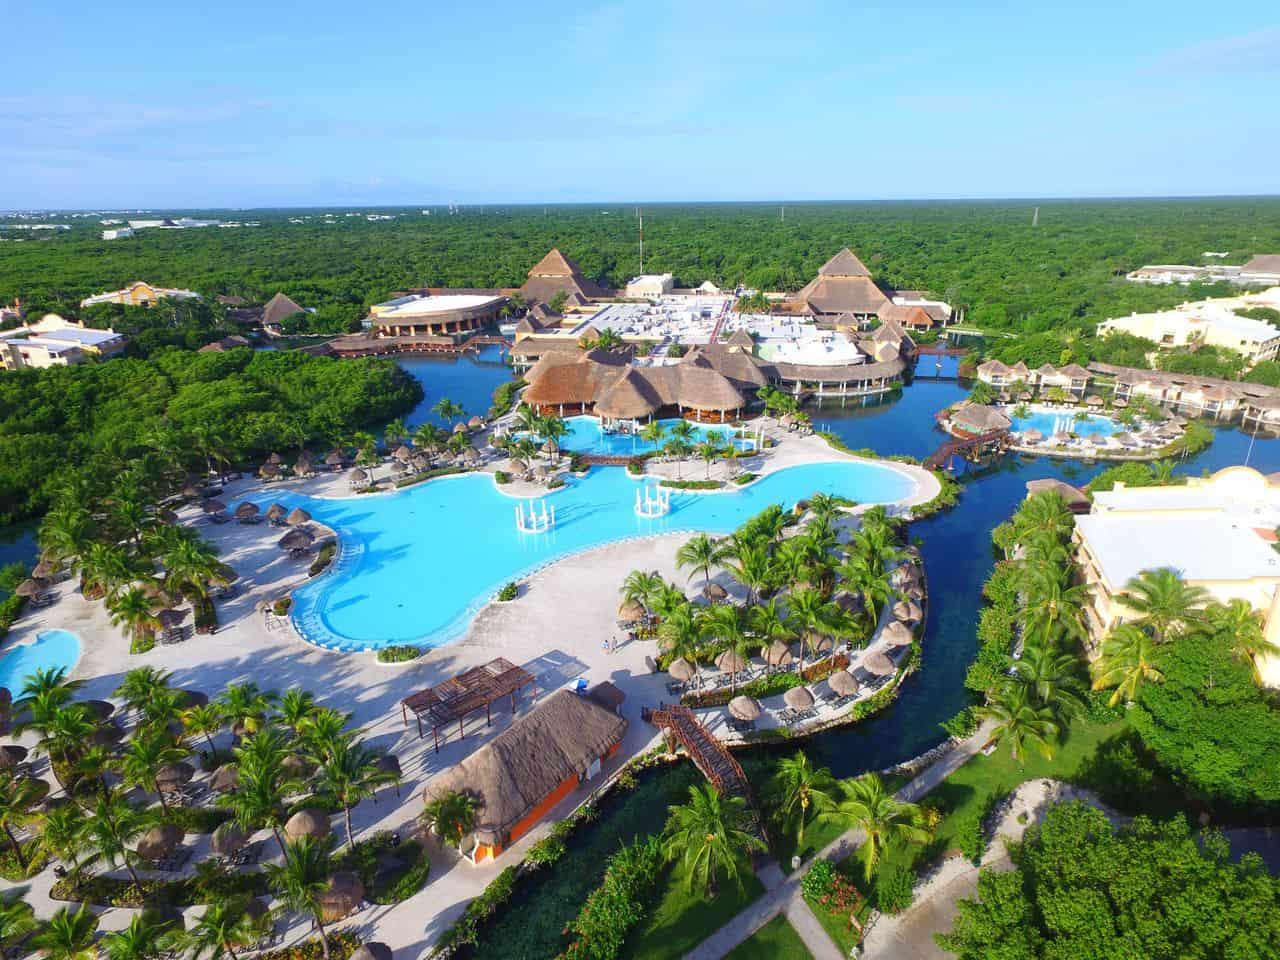 Grand Palladium Costa Mujeres Resort & Spa, Cancun